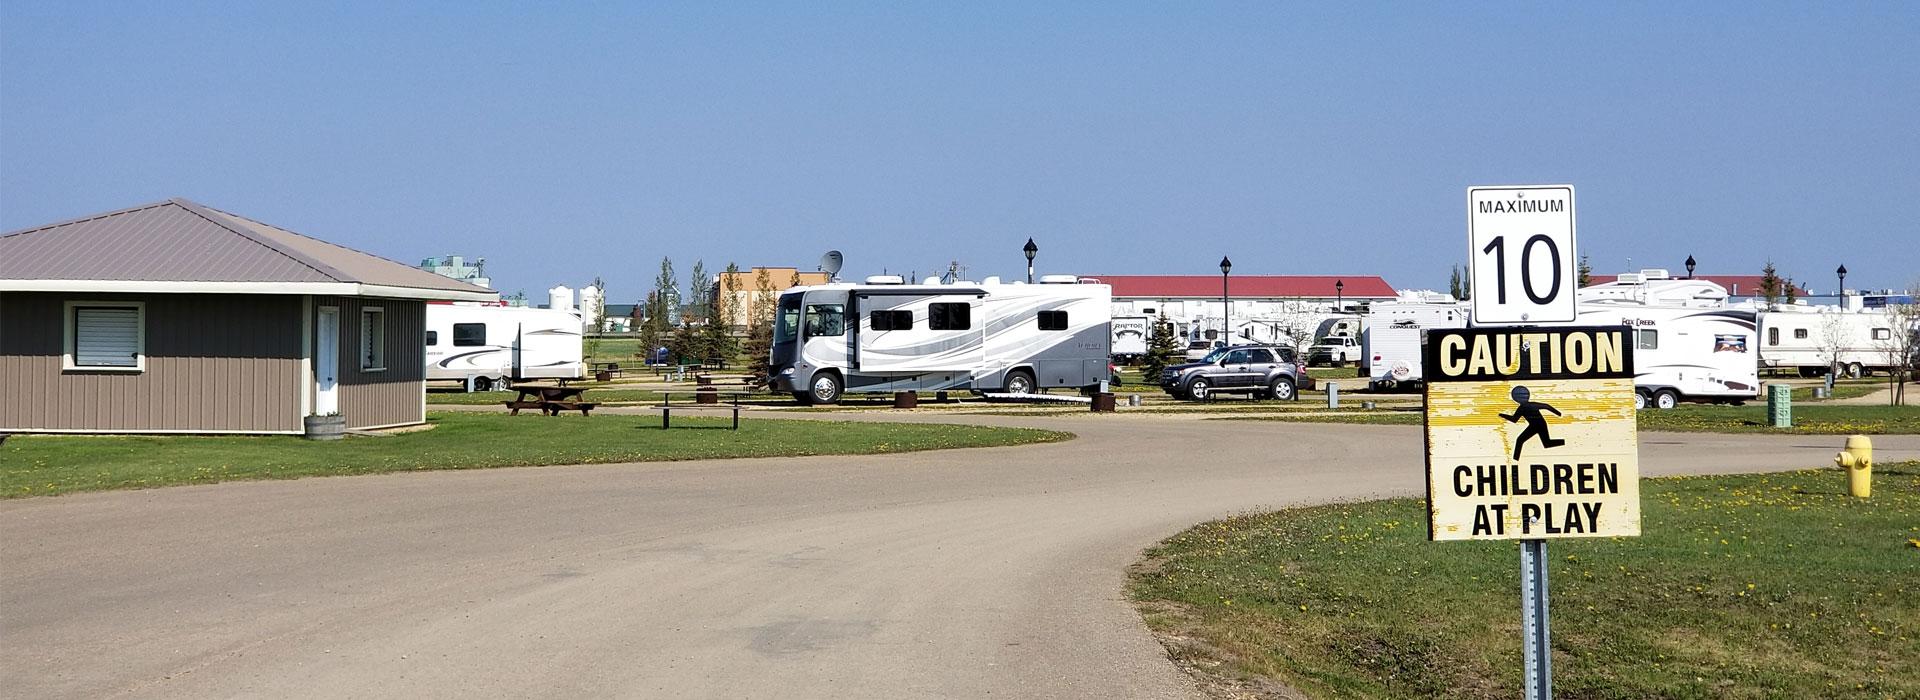 CRE-RV-Park-Campground-003